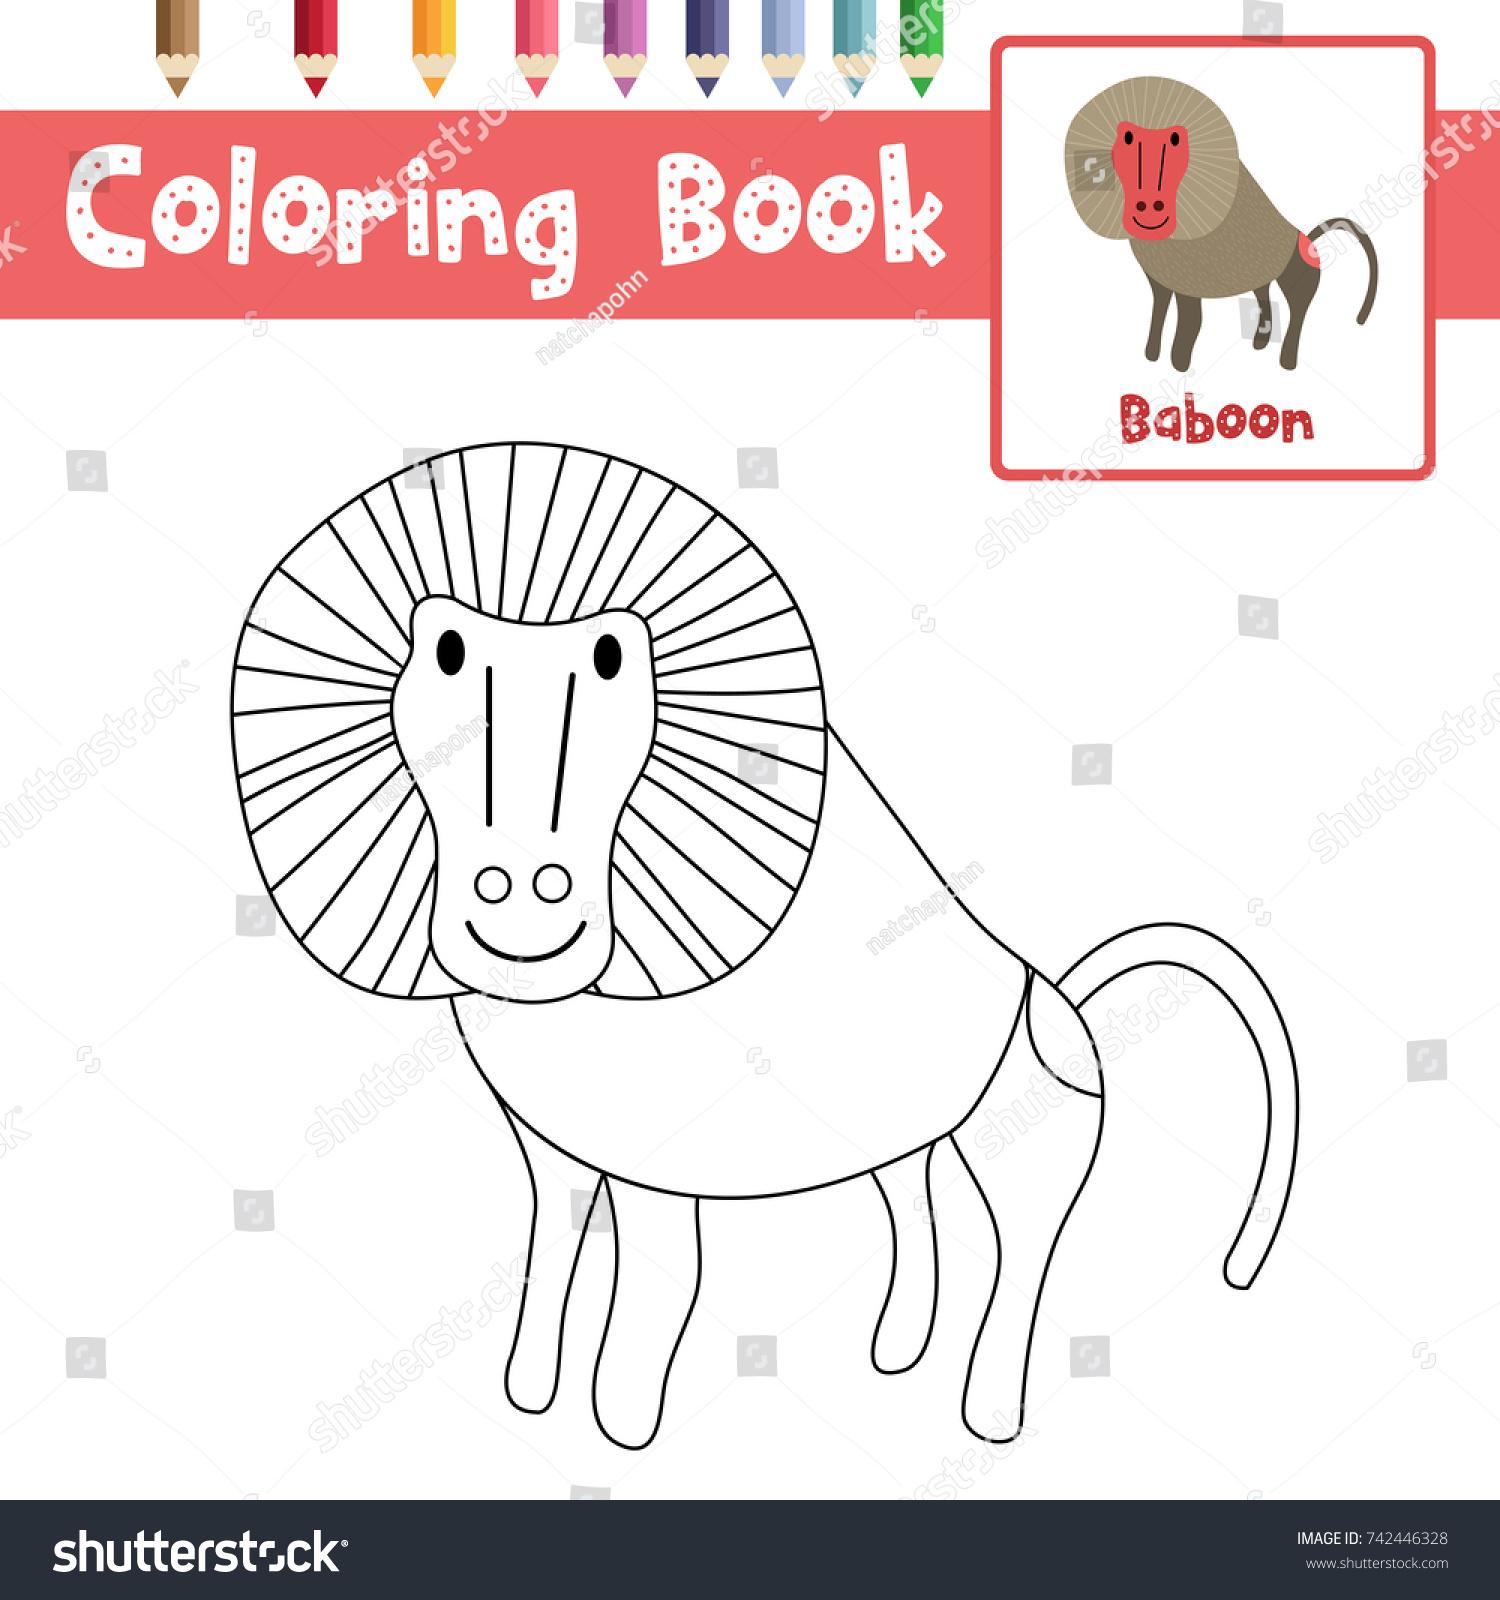 Coloring Page Baboon Animals Preschool Kids Stock Vector (Royalty ...